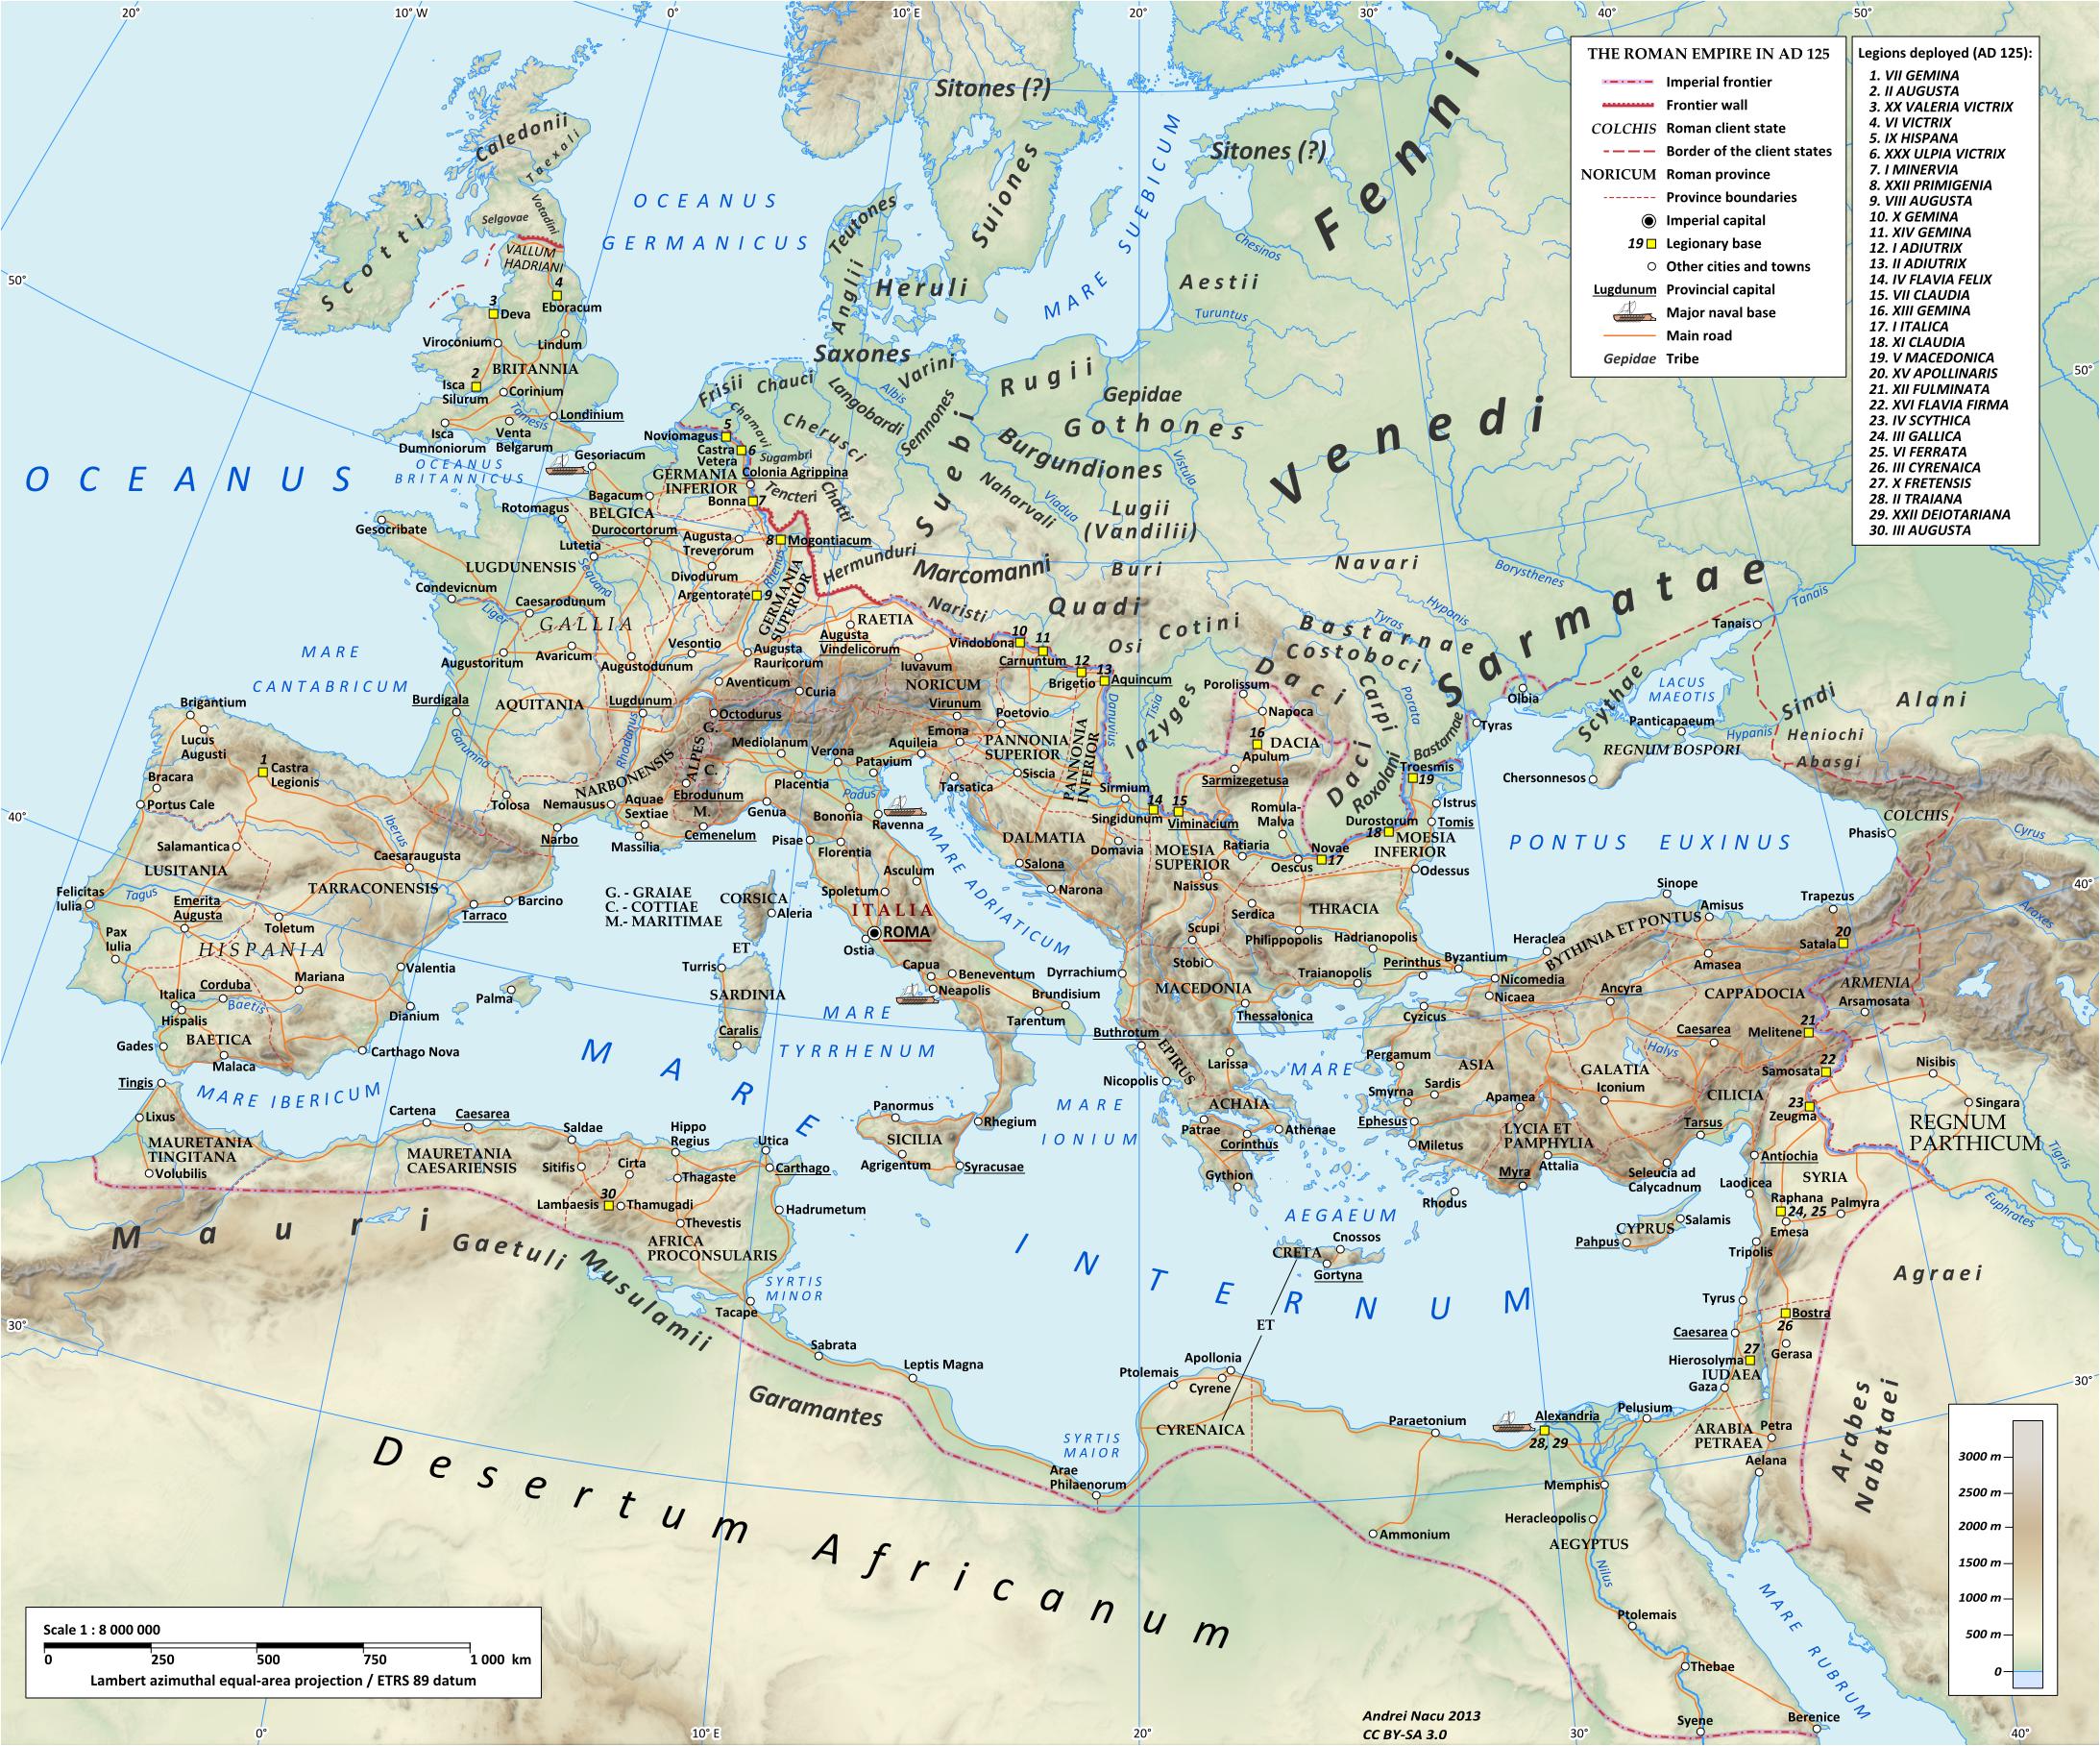 Map of the Roman empire in 125 AD under emperor Hadrian  maps